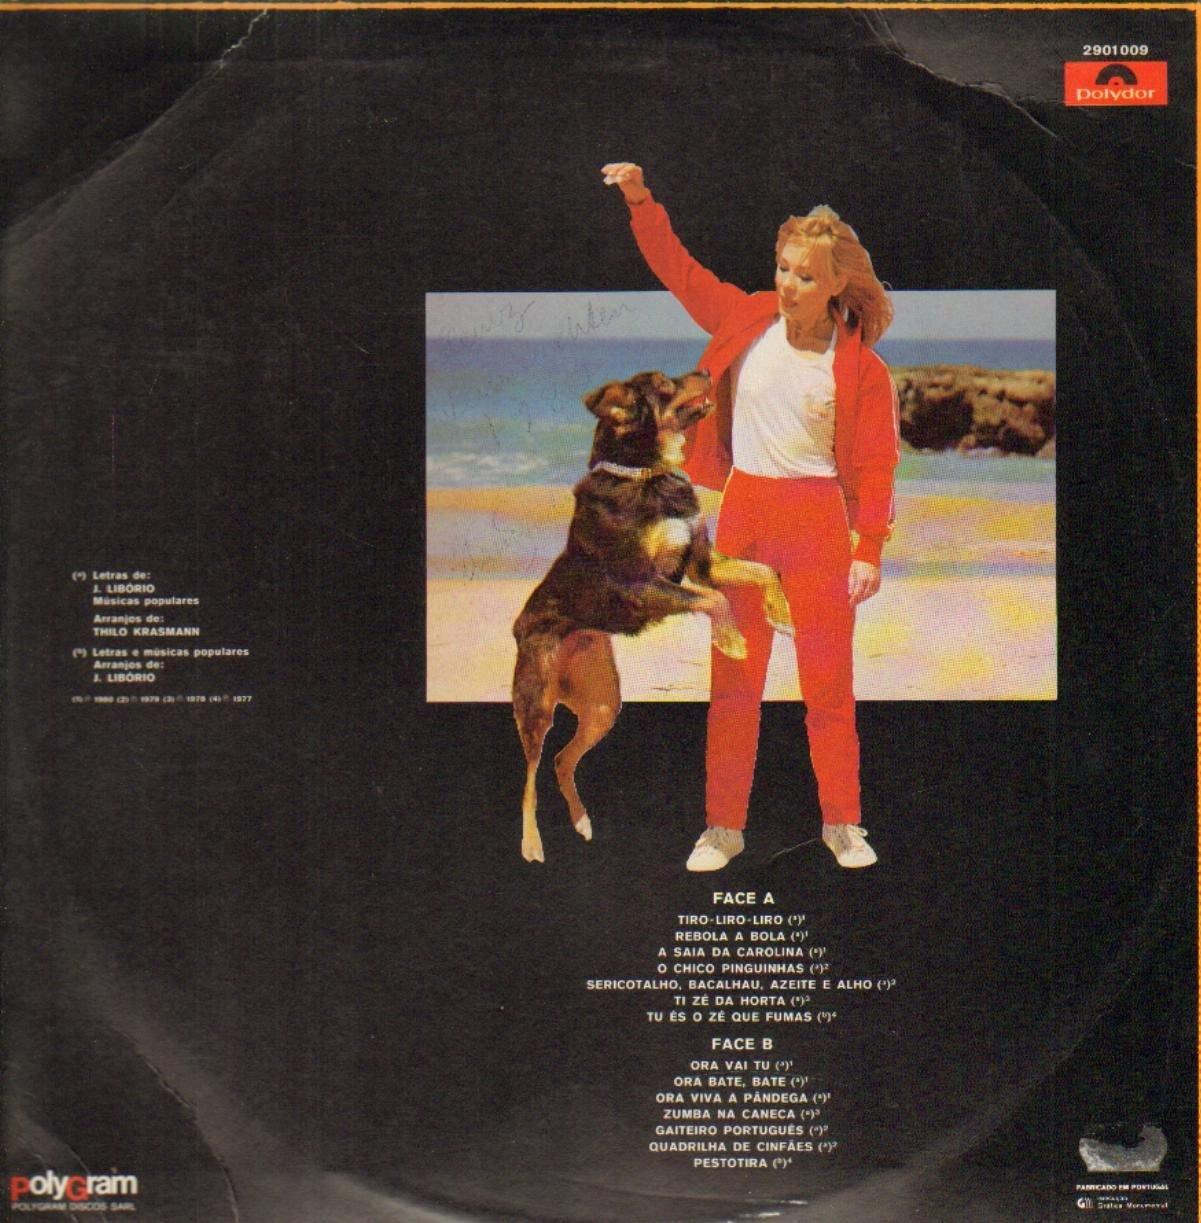 Tonicha - A Arte E A Musica De Tonicha [LP] - Amazon com Music